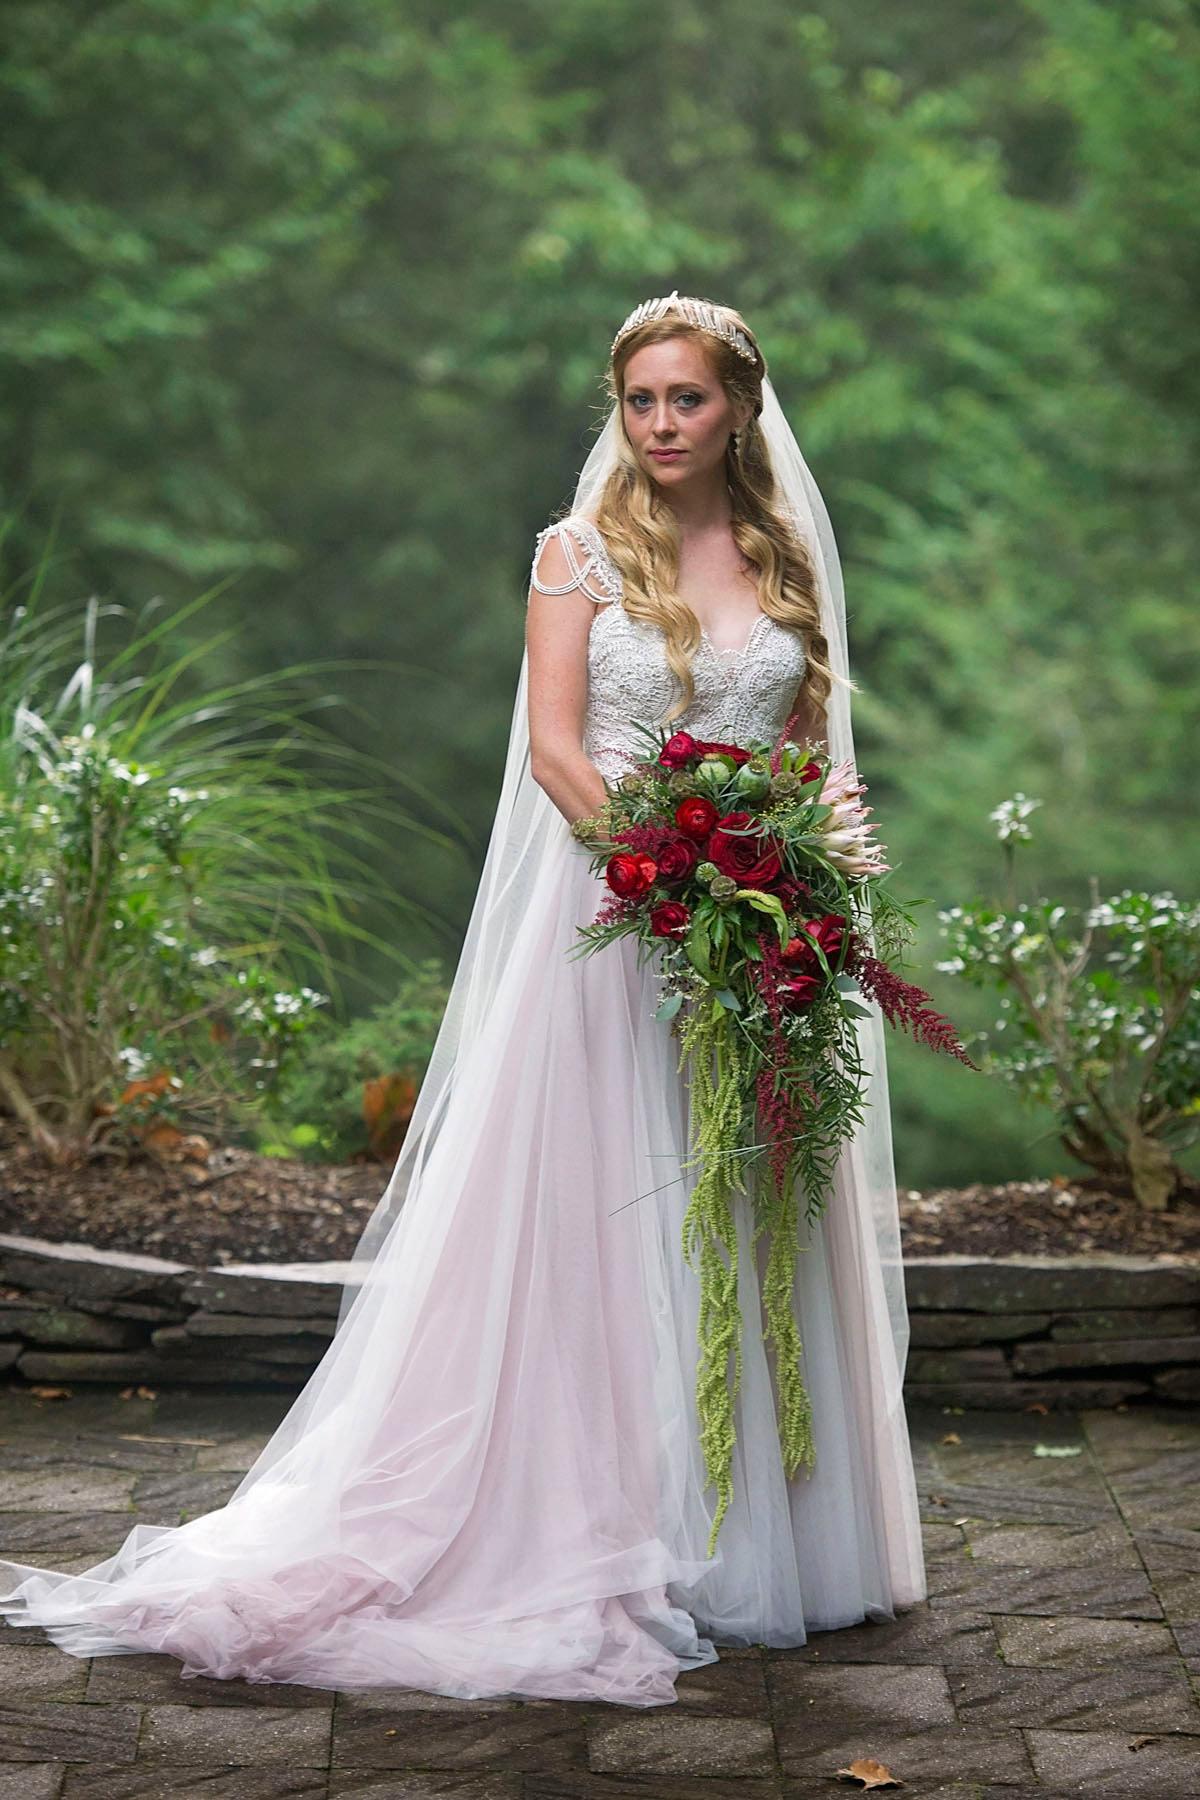 Bucks_County_wedding_photographer_Stroudsmoor_country_inn_wedding_Philadelphia_wedding_photographer_06_fairy_inspired_bride_stroudsmoor_country_inn.JPG